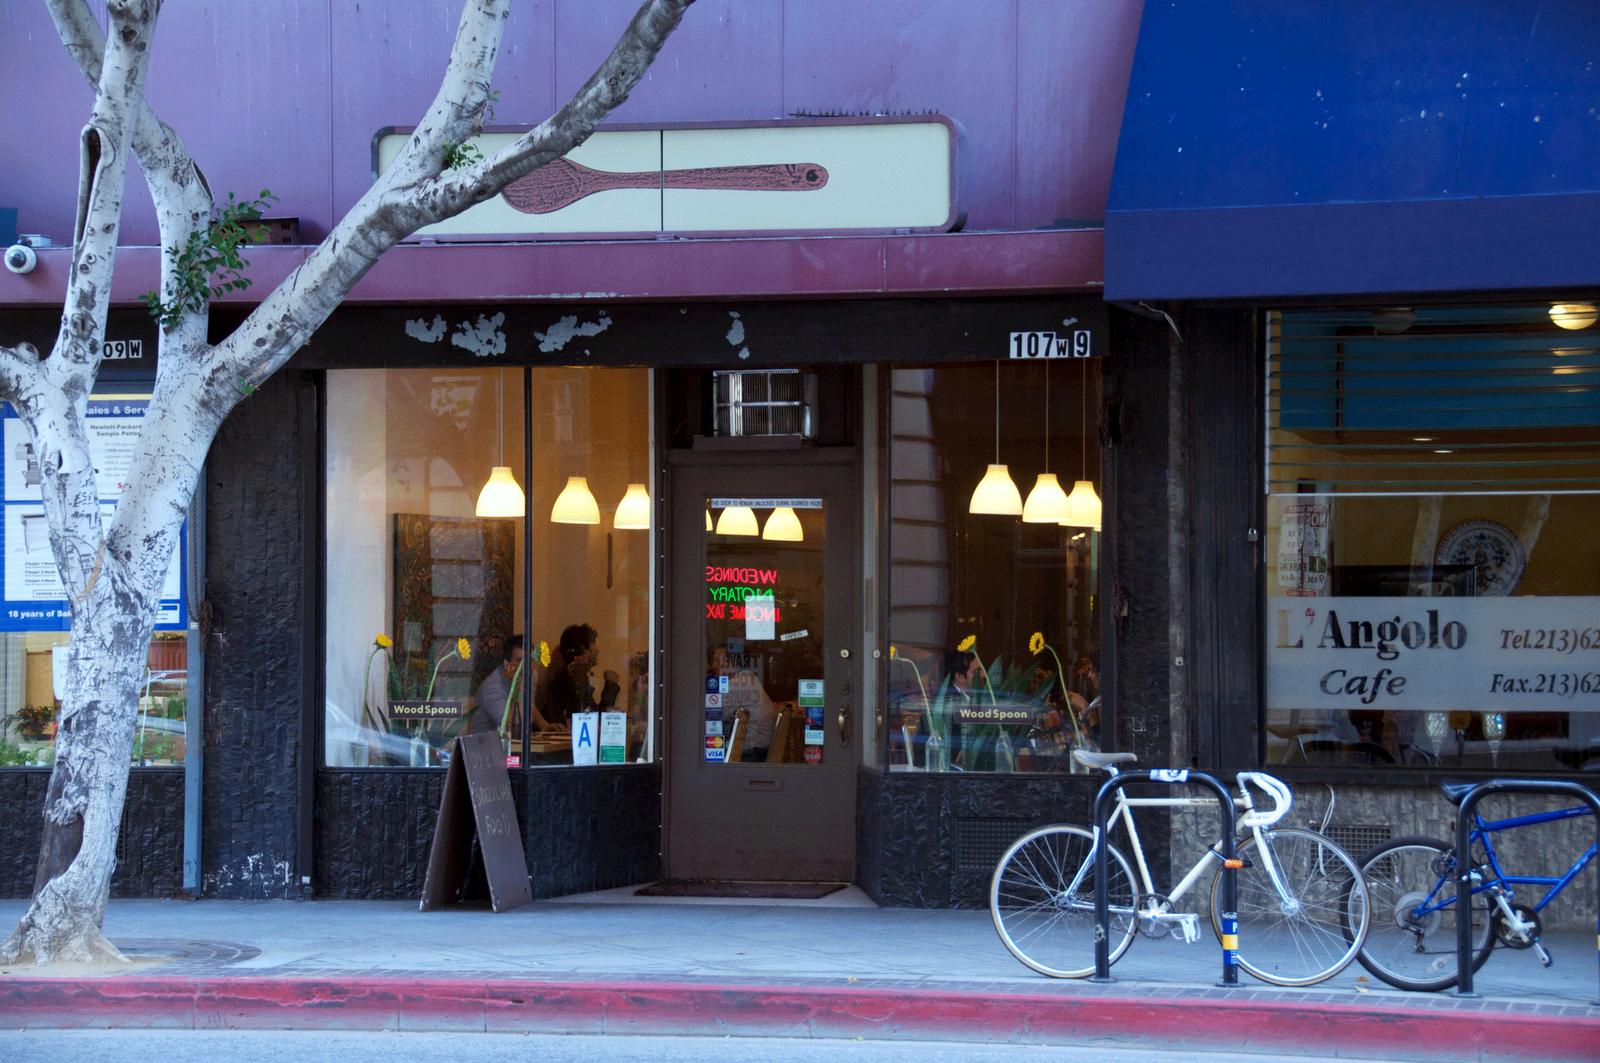 LA Fashion District: Brazilian Dining at Wood Spoon - Wood Spoon! Get it? 107 W. 9th St. Los Angeles, CA